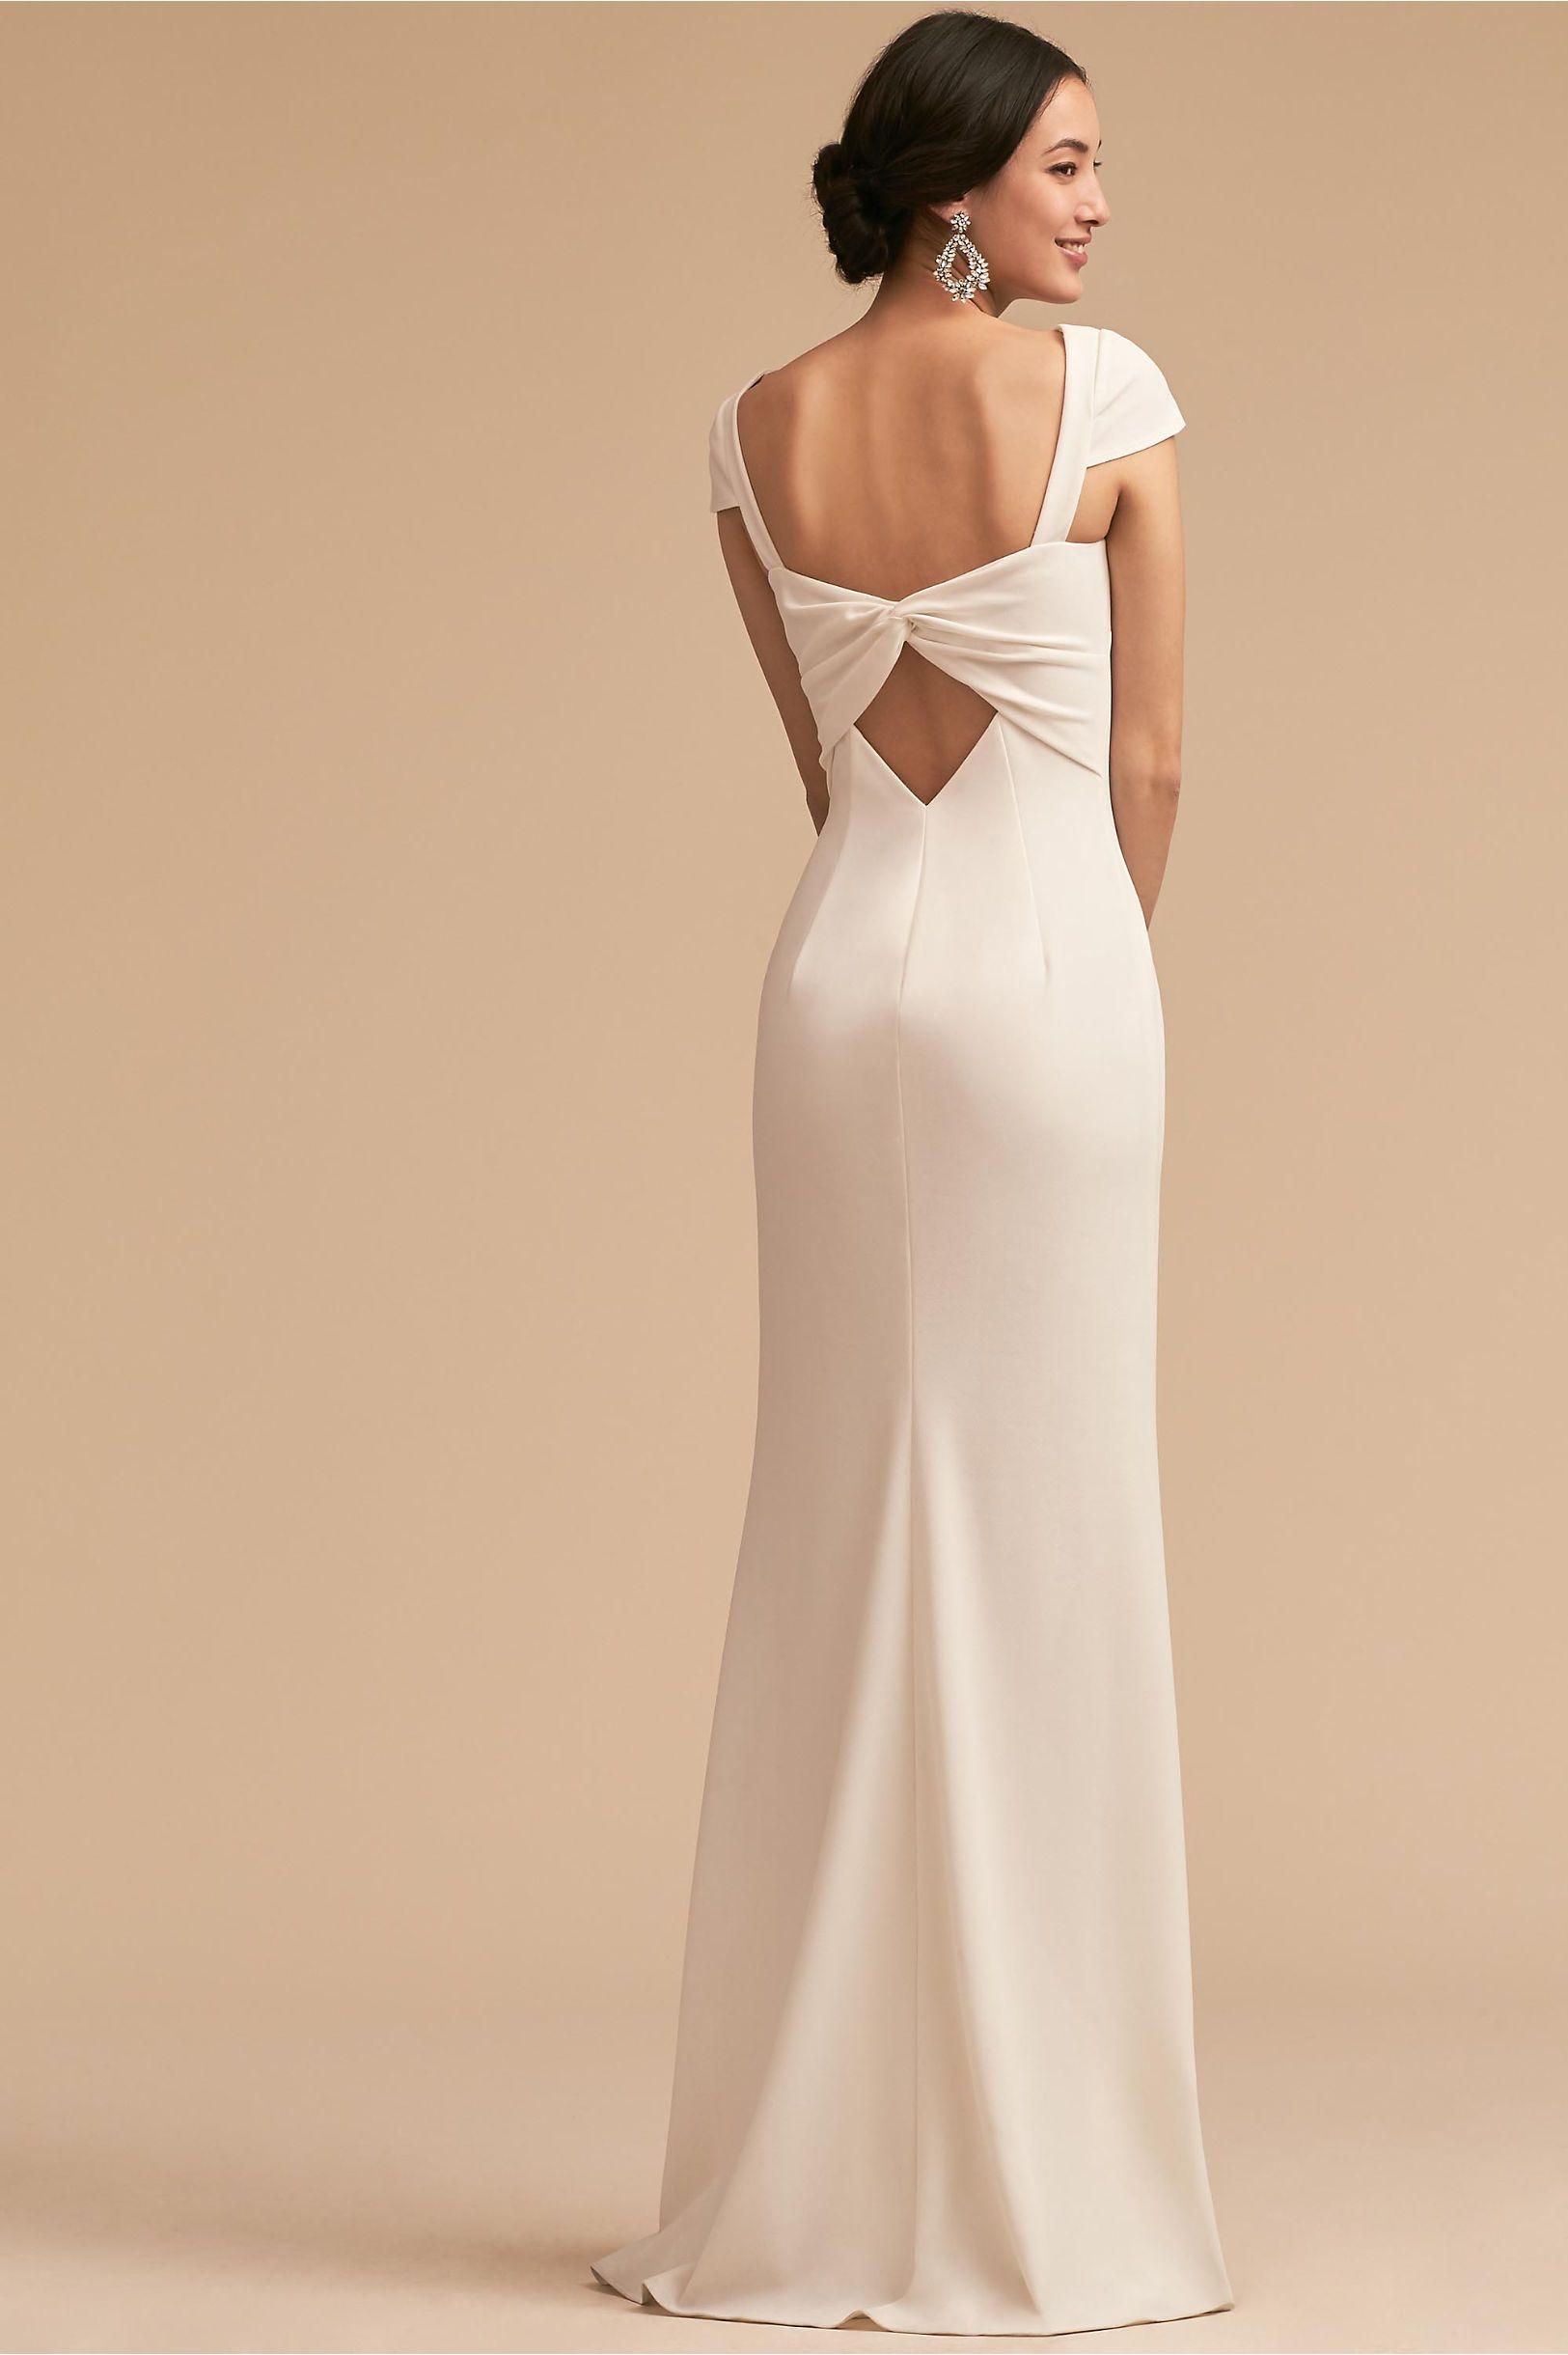 BHLDN Madison Dress Ivory in Bride | BHLDN | The Knot | Pinterest ...